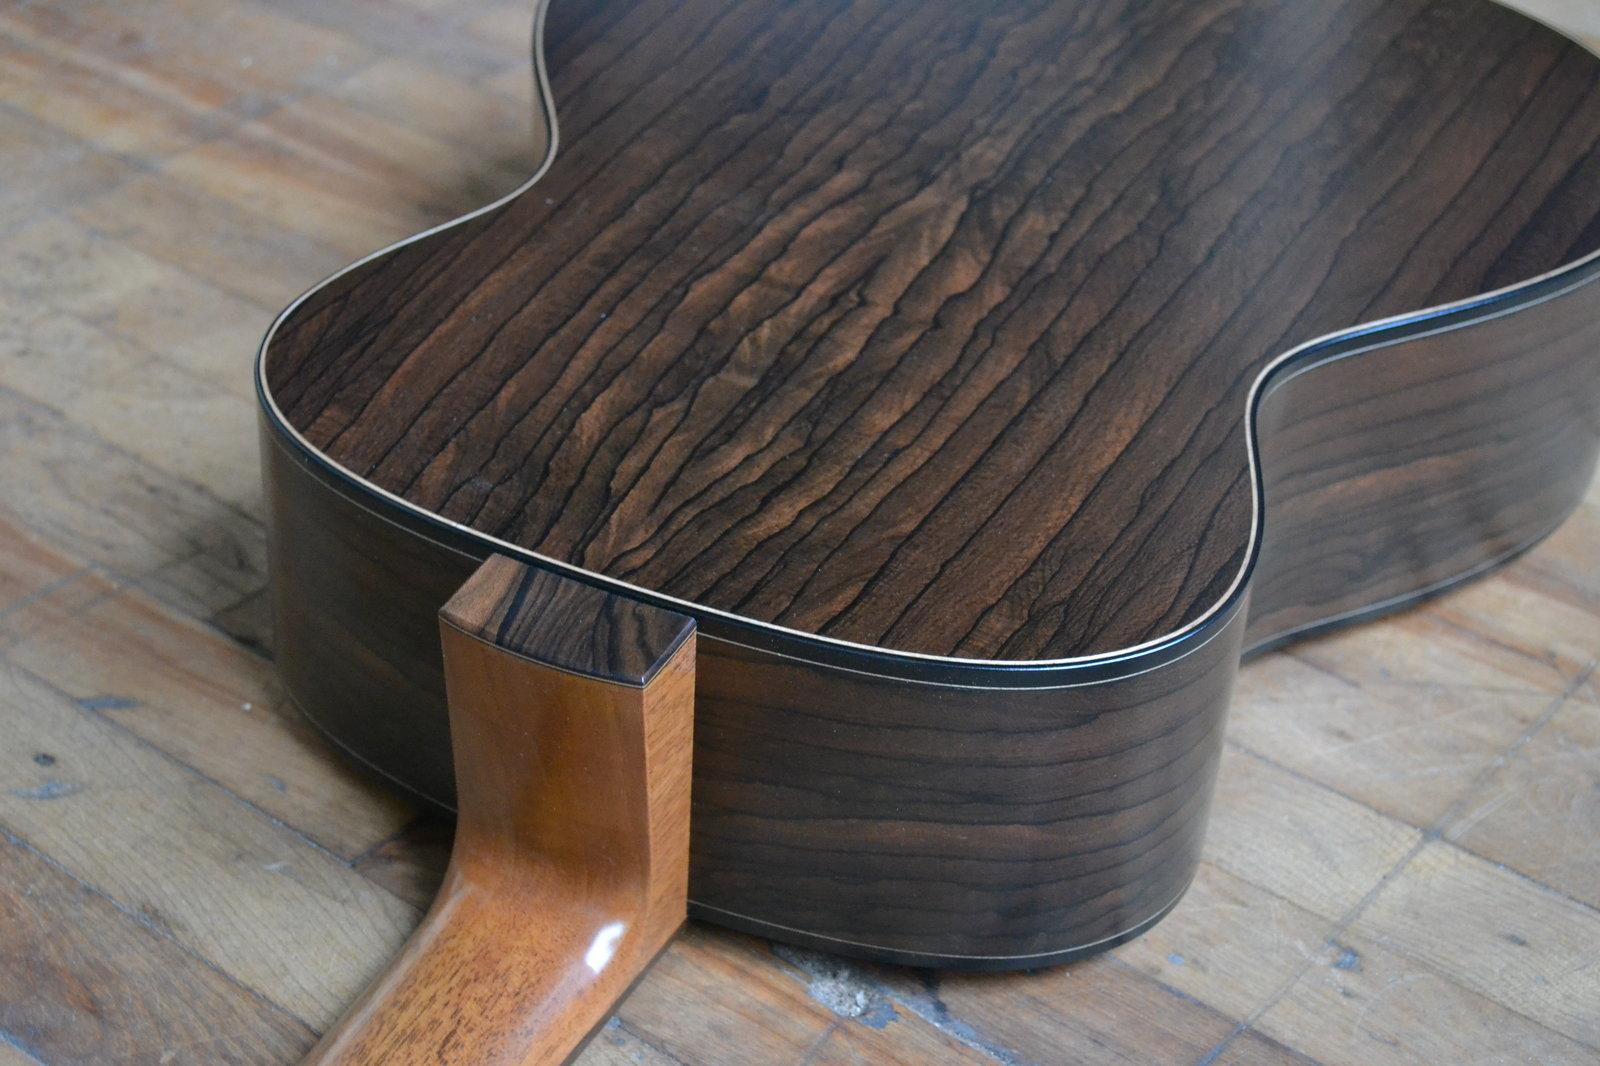 Guitare Baron 12 cordes (fabrication en cours) - Page 2 191212024220467440